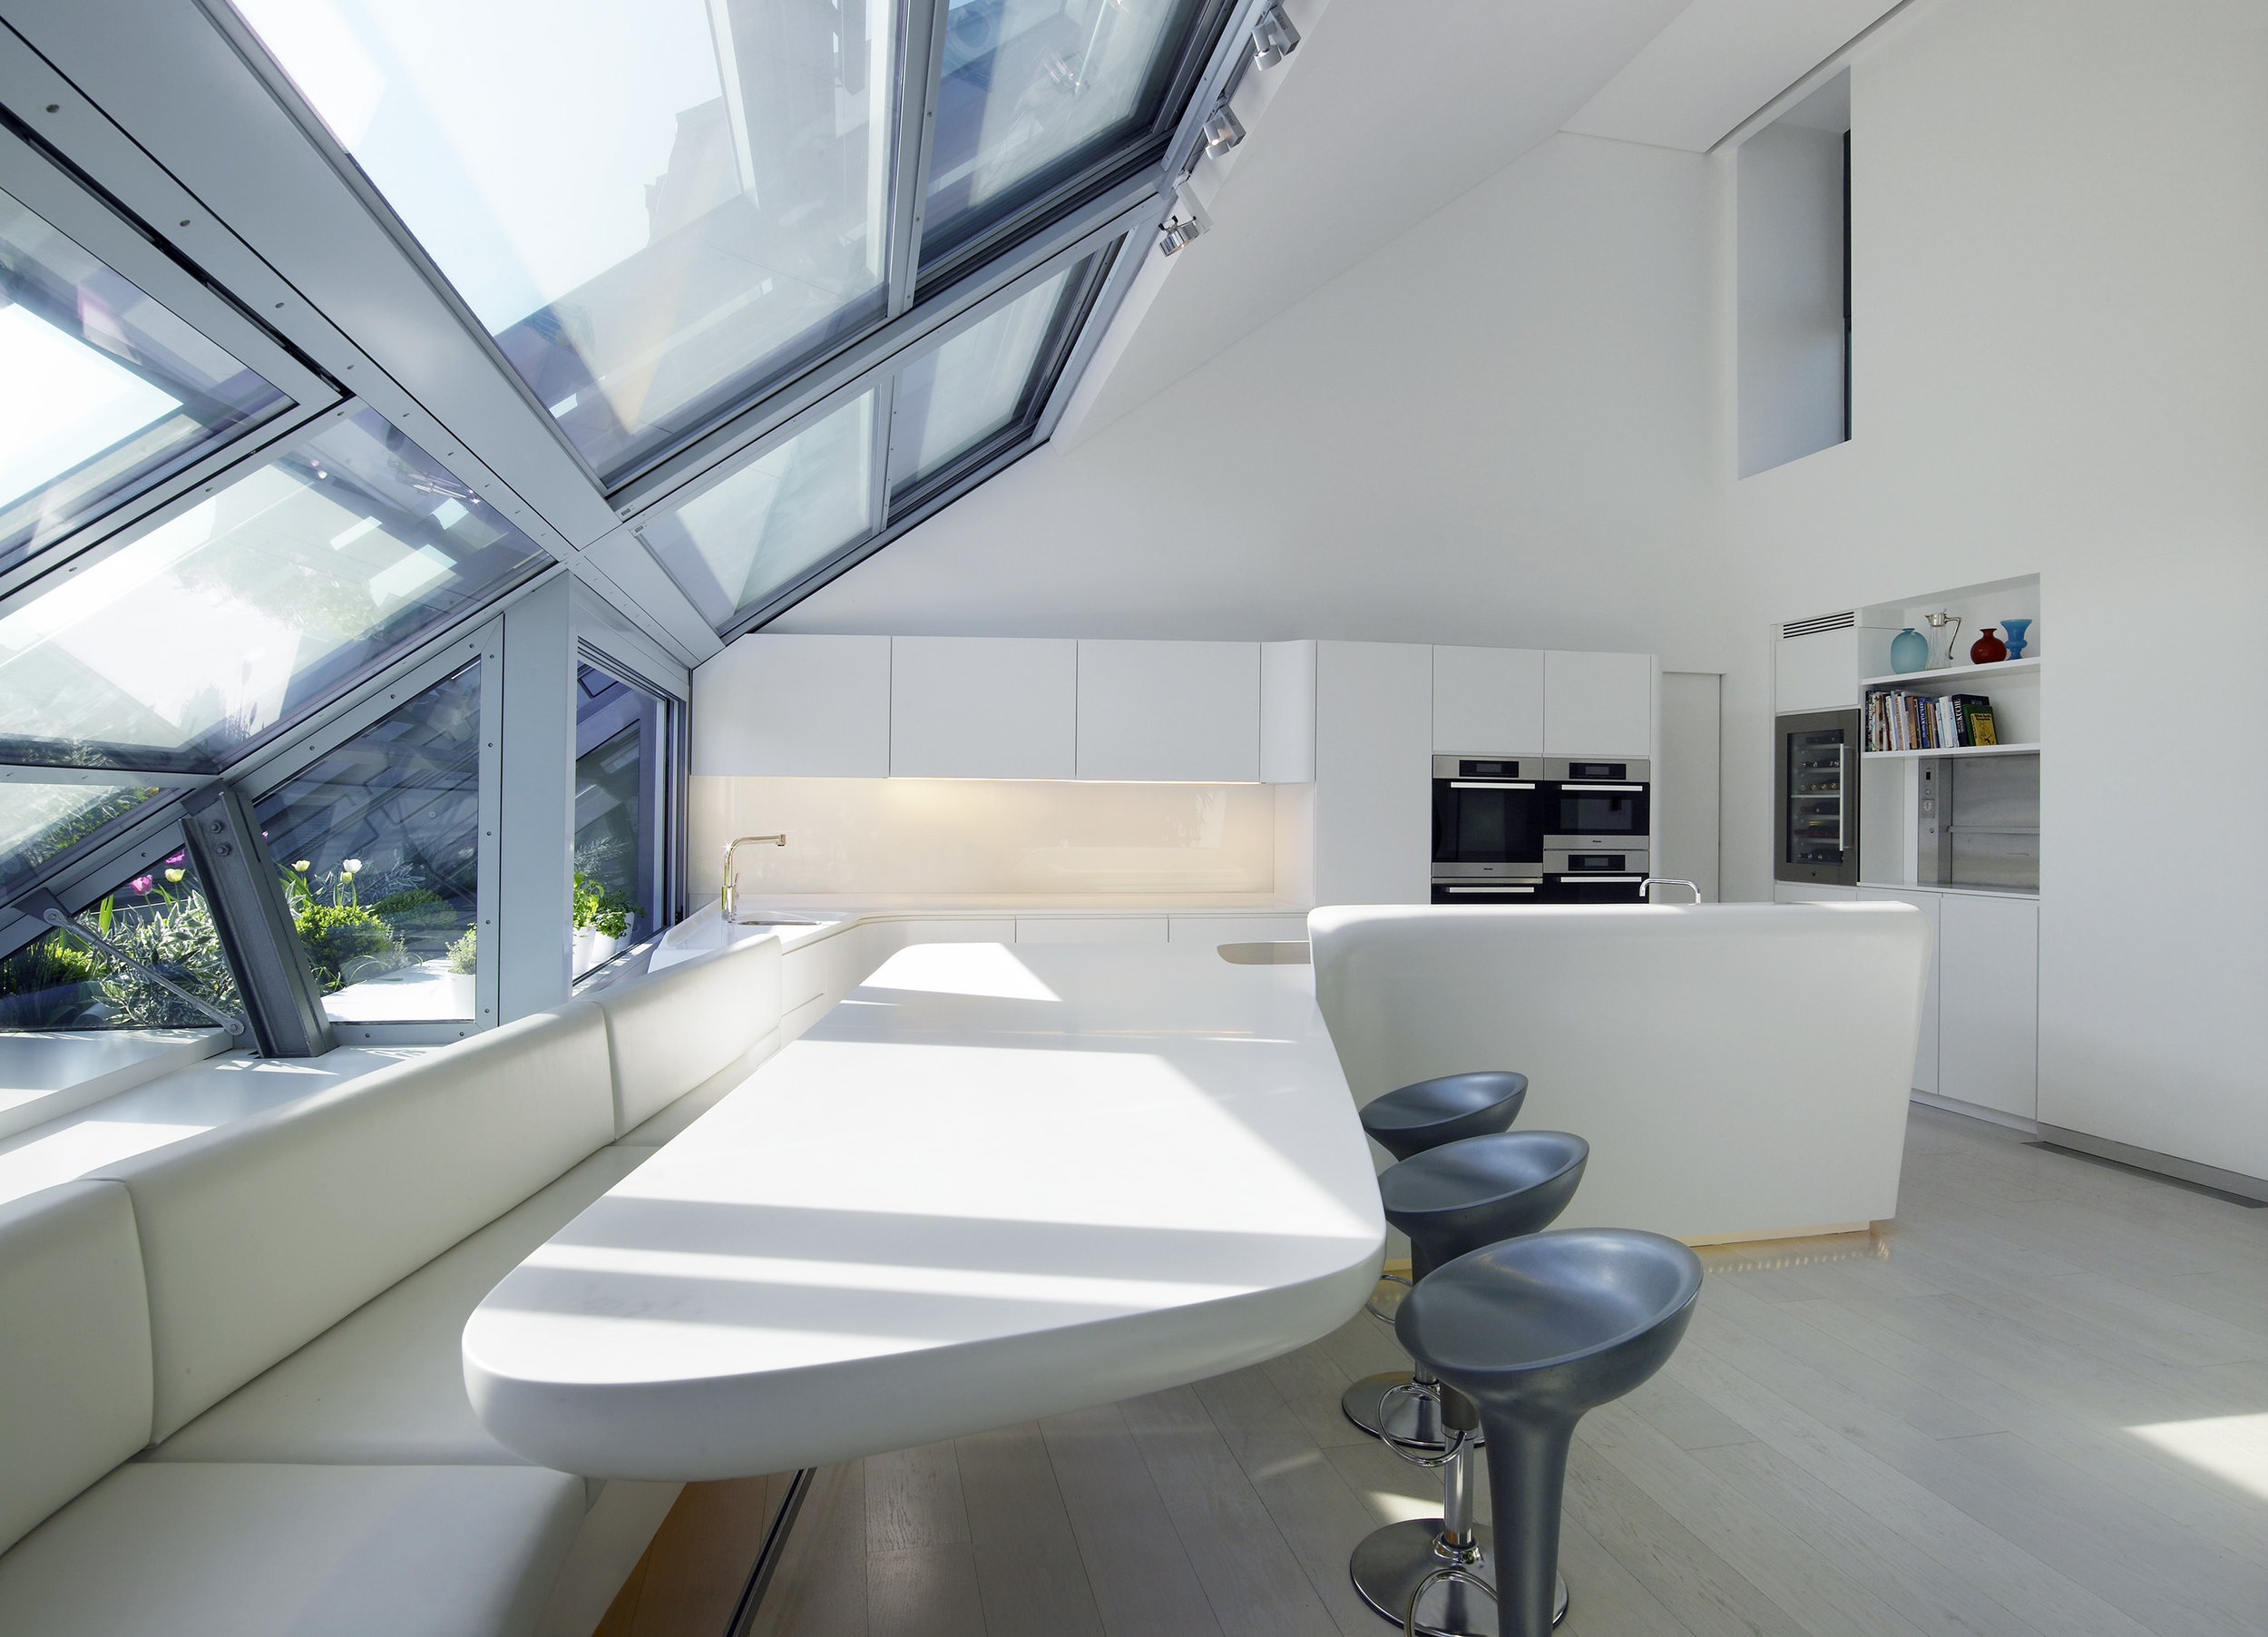 A01 architects - Cityloft_(c) Nadine Blanchard_web05.jpg